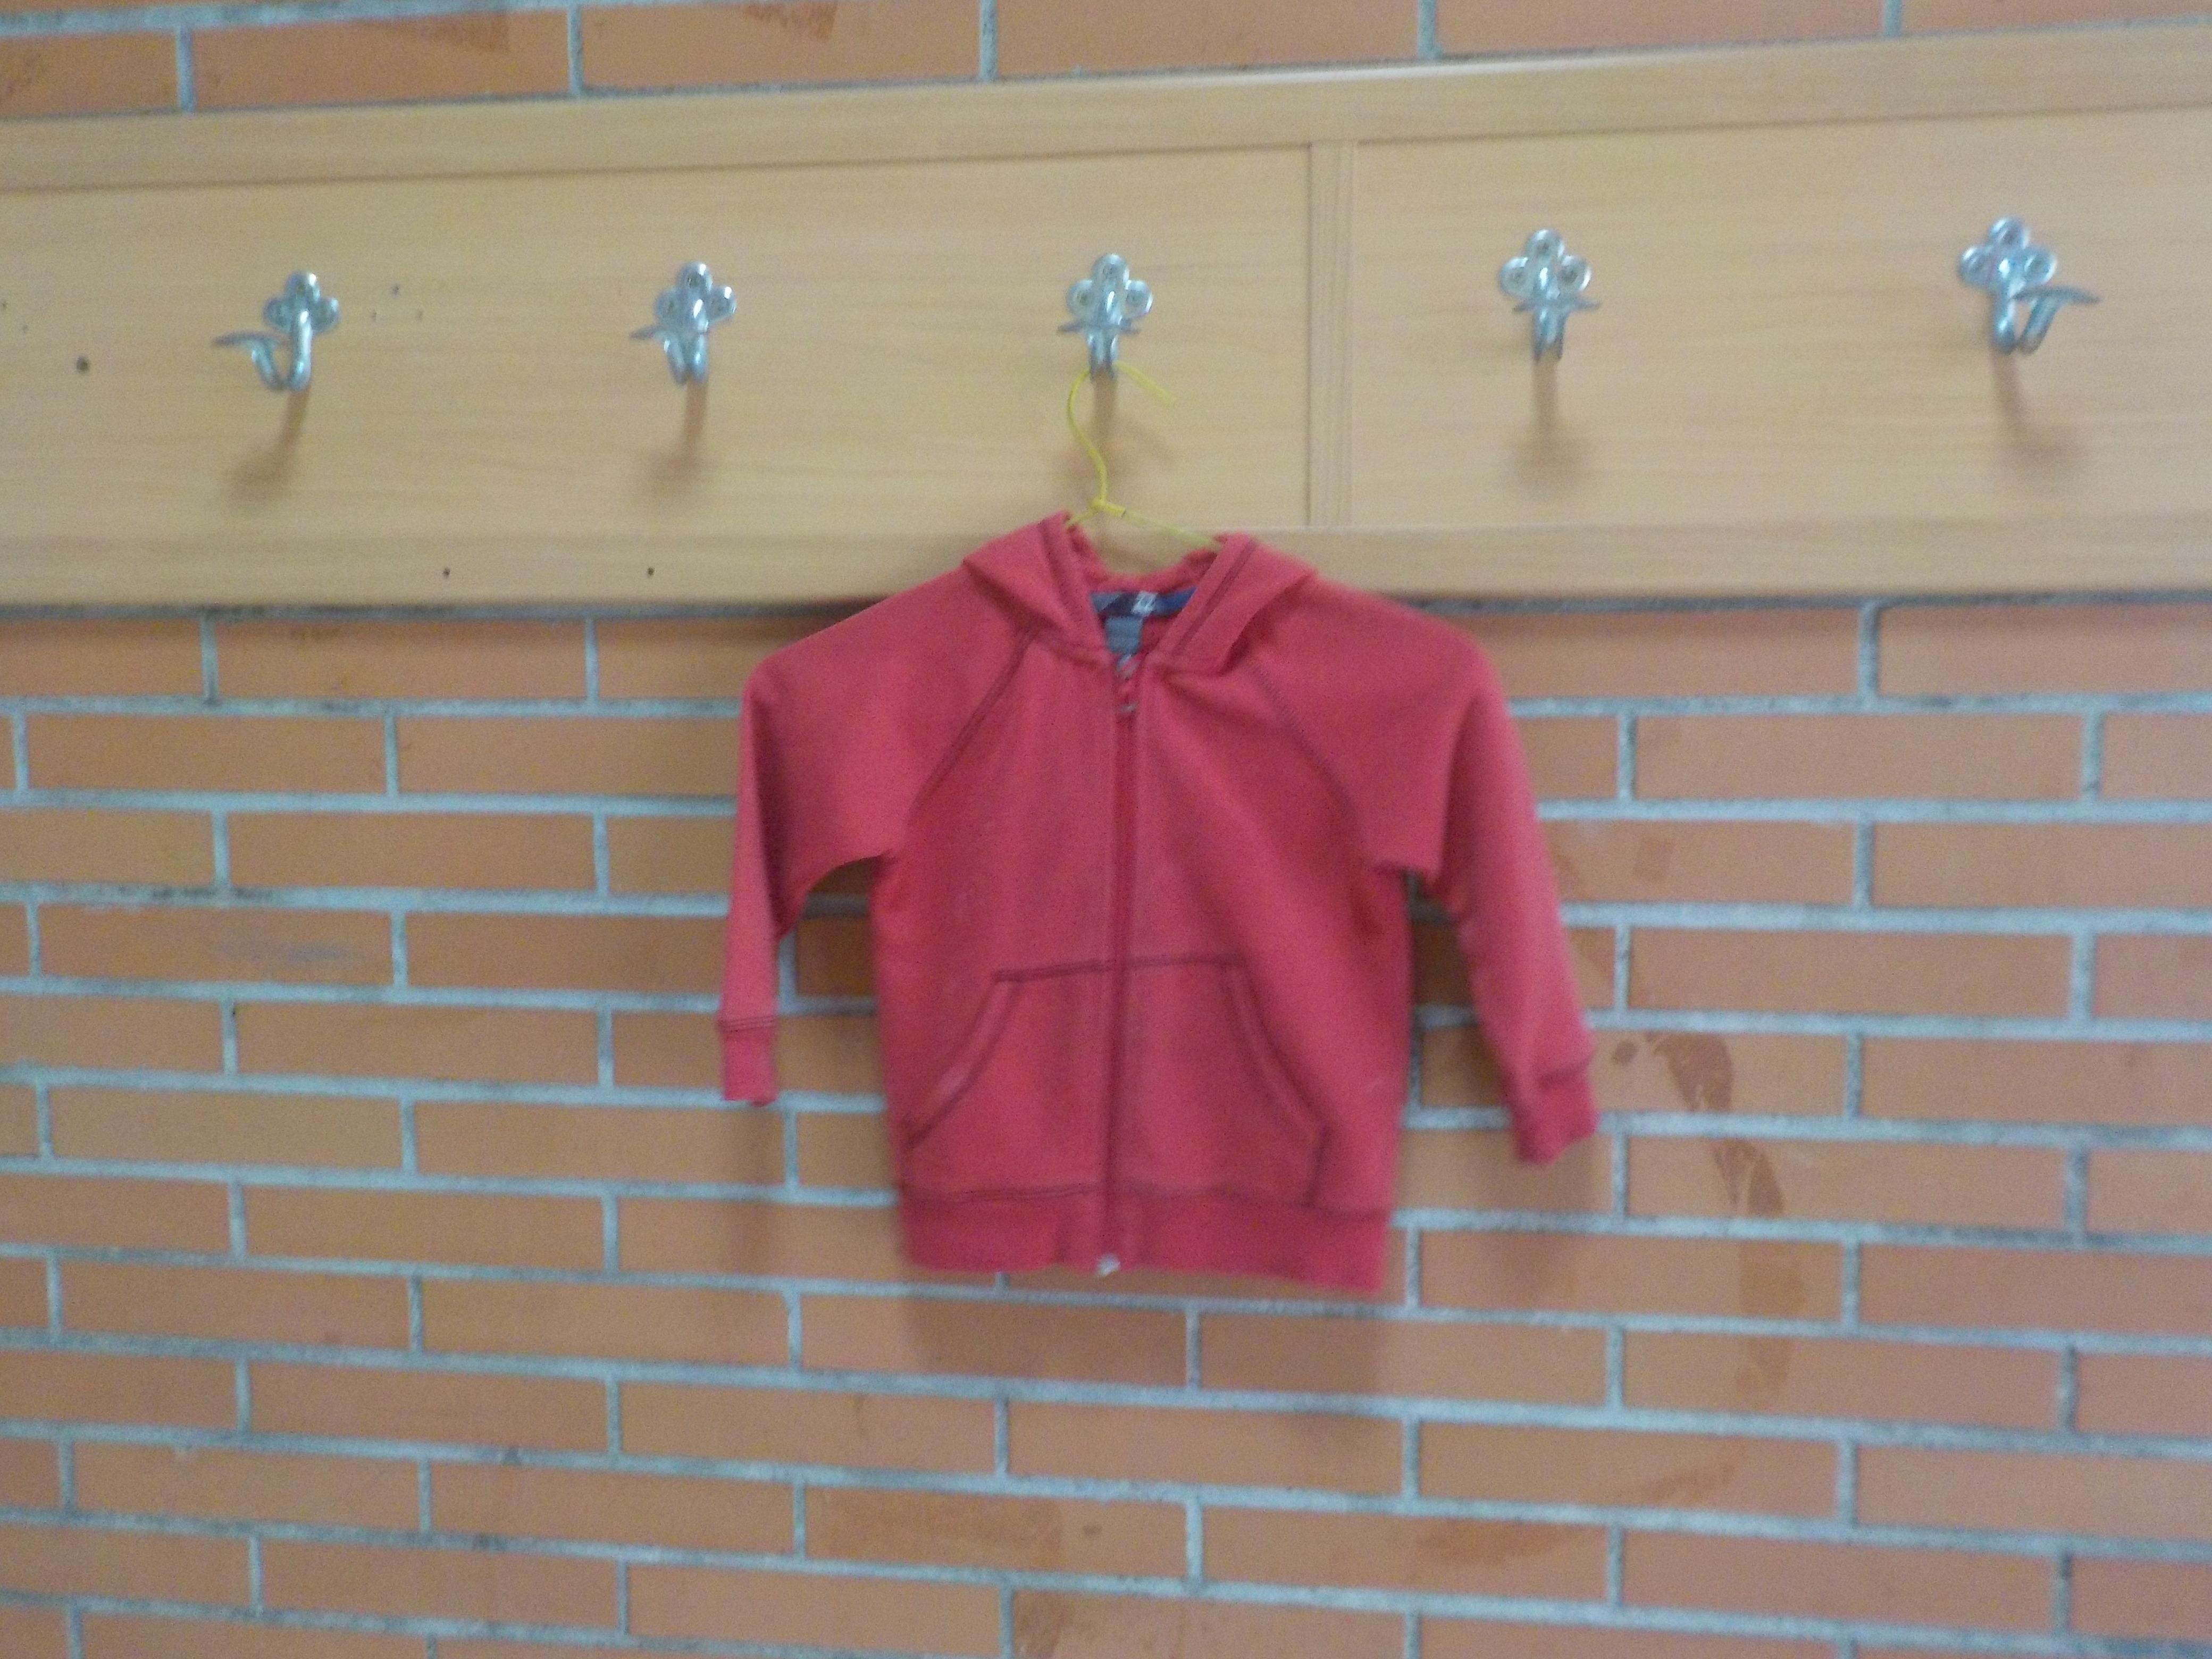 Catalogo de ropa olvidada 1  2018 9